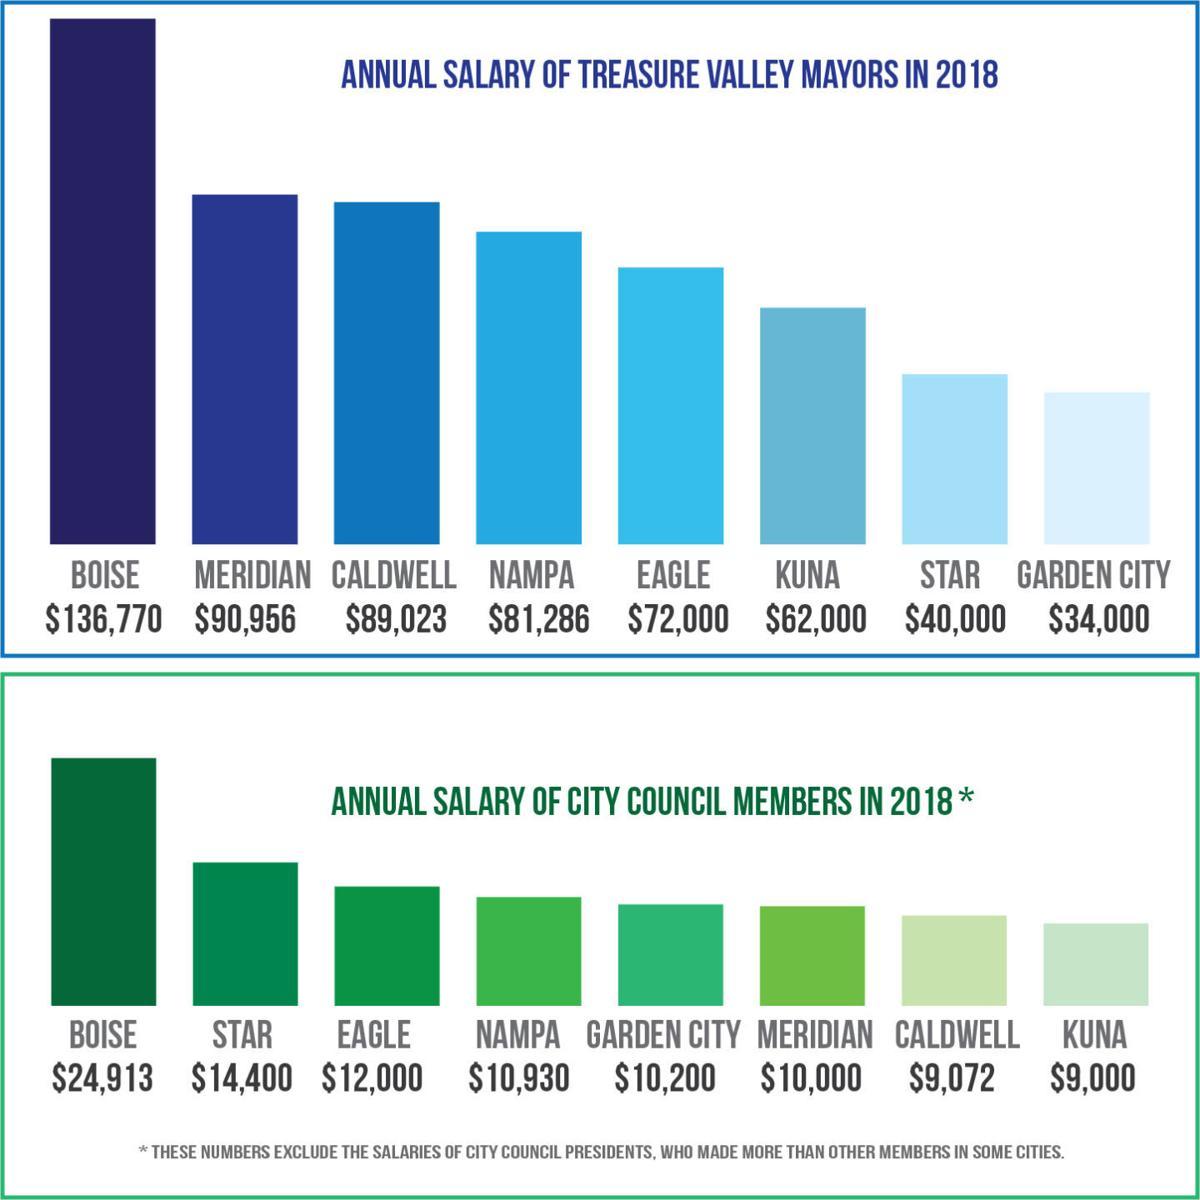 City Council salaries